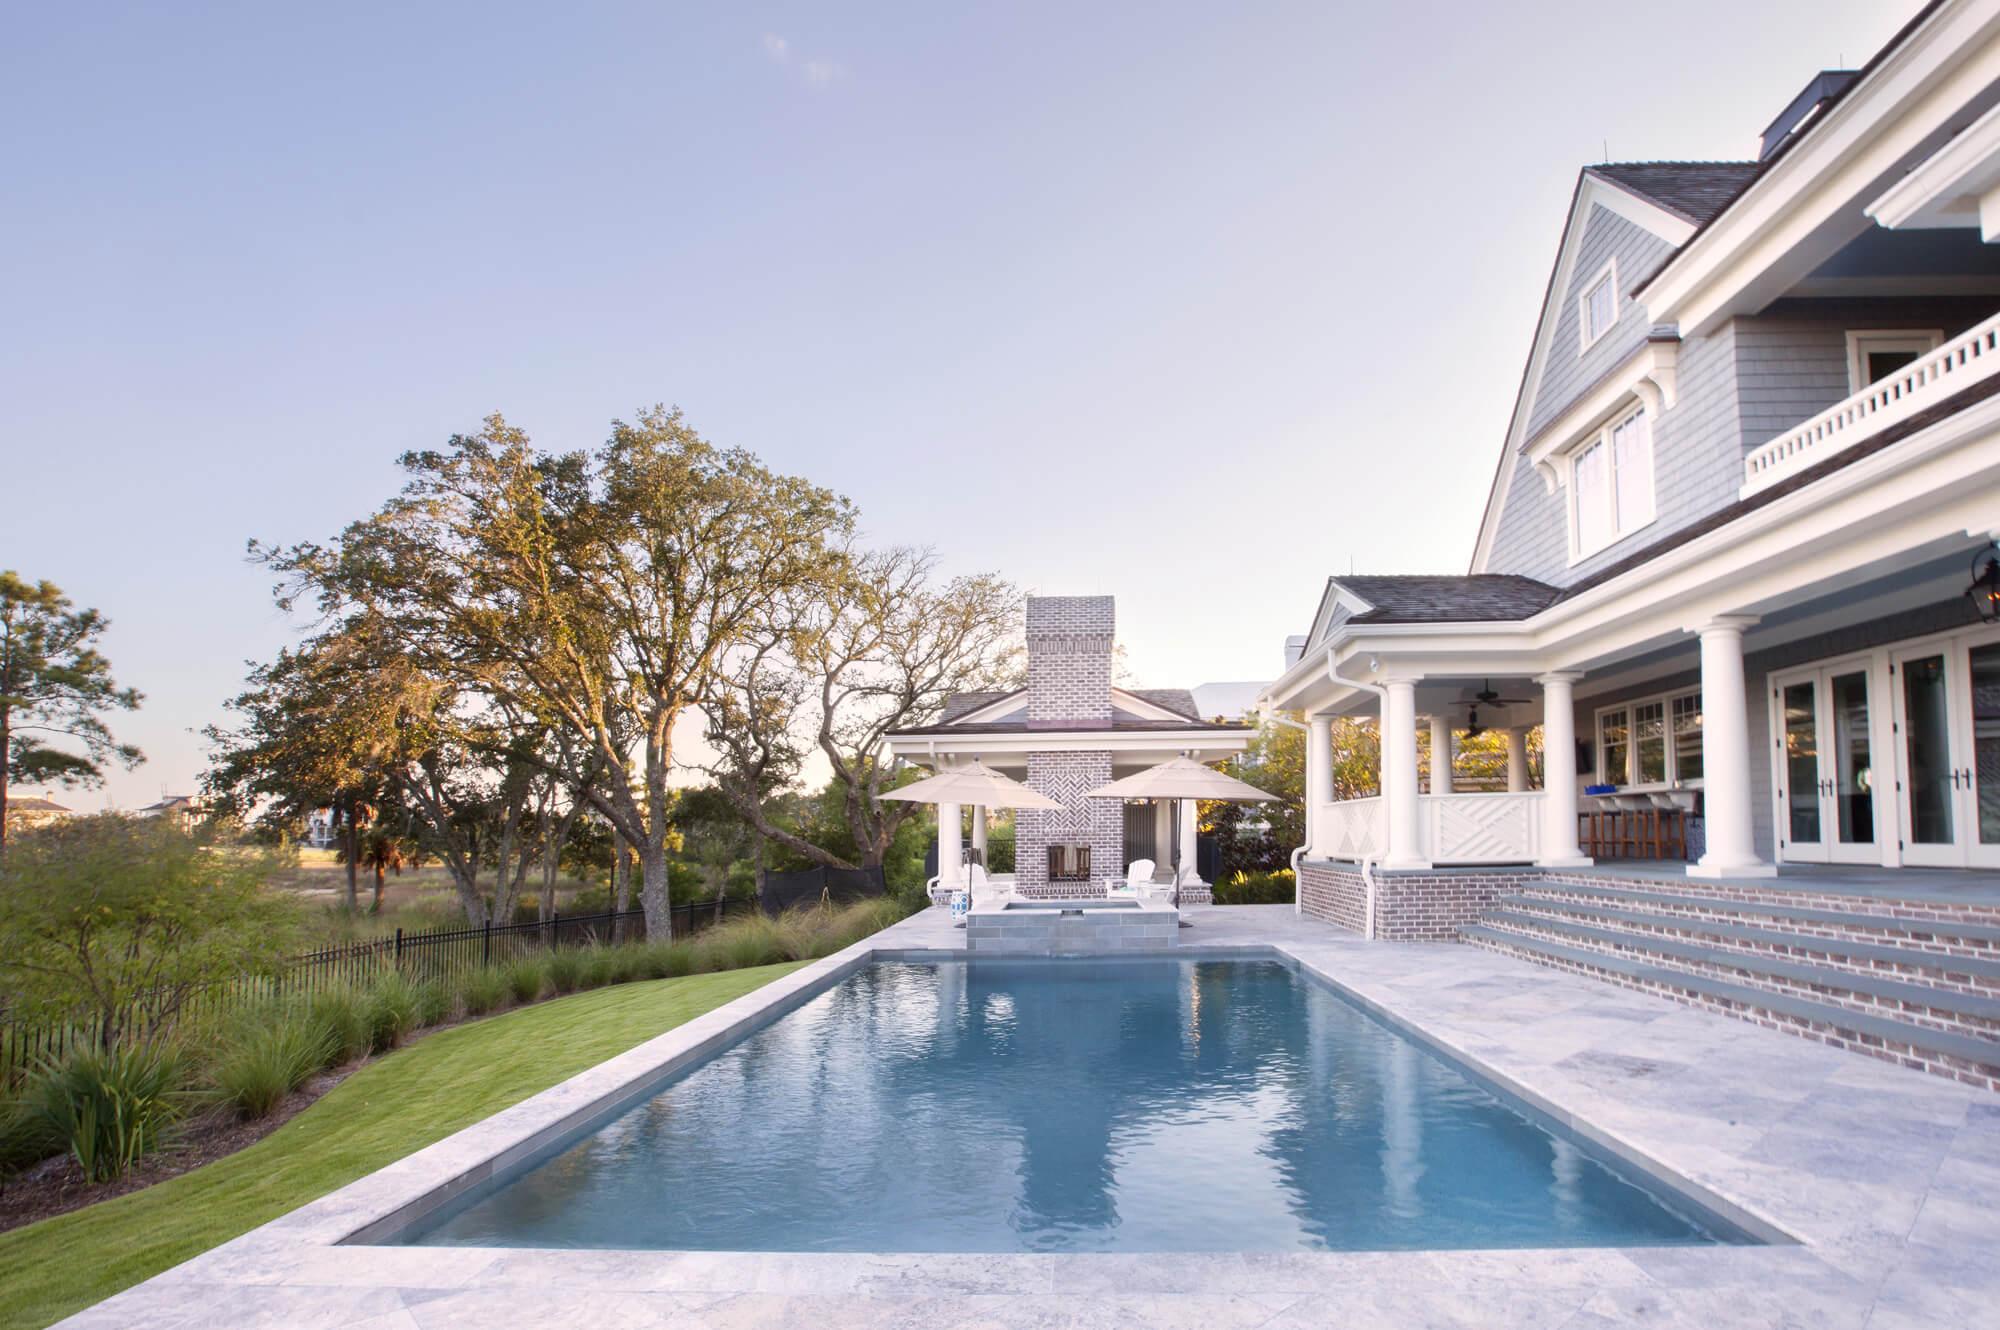 OSDLA-Outdoor-Spatial-Design-Charleston